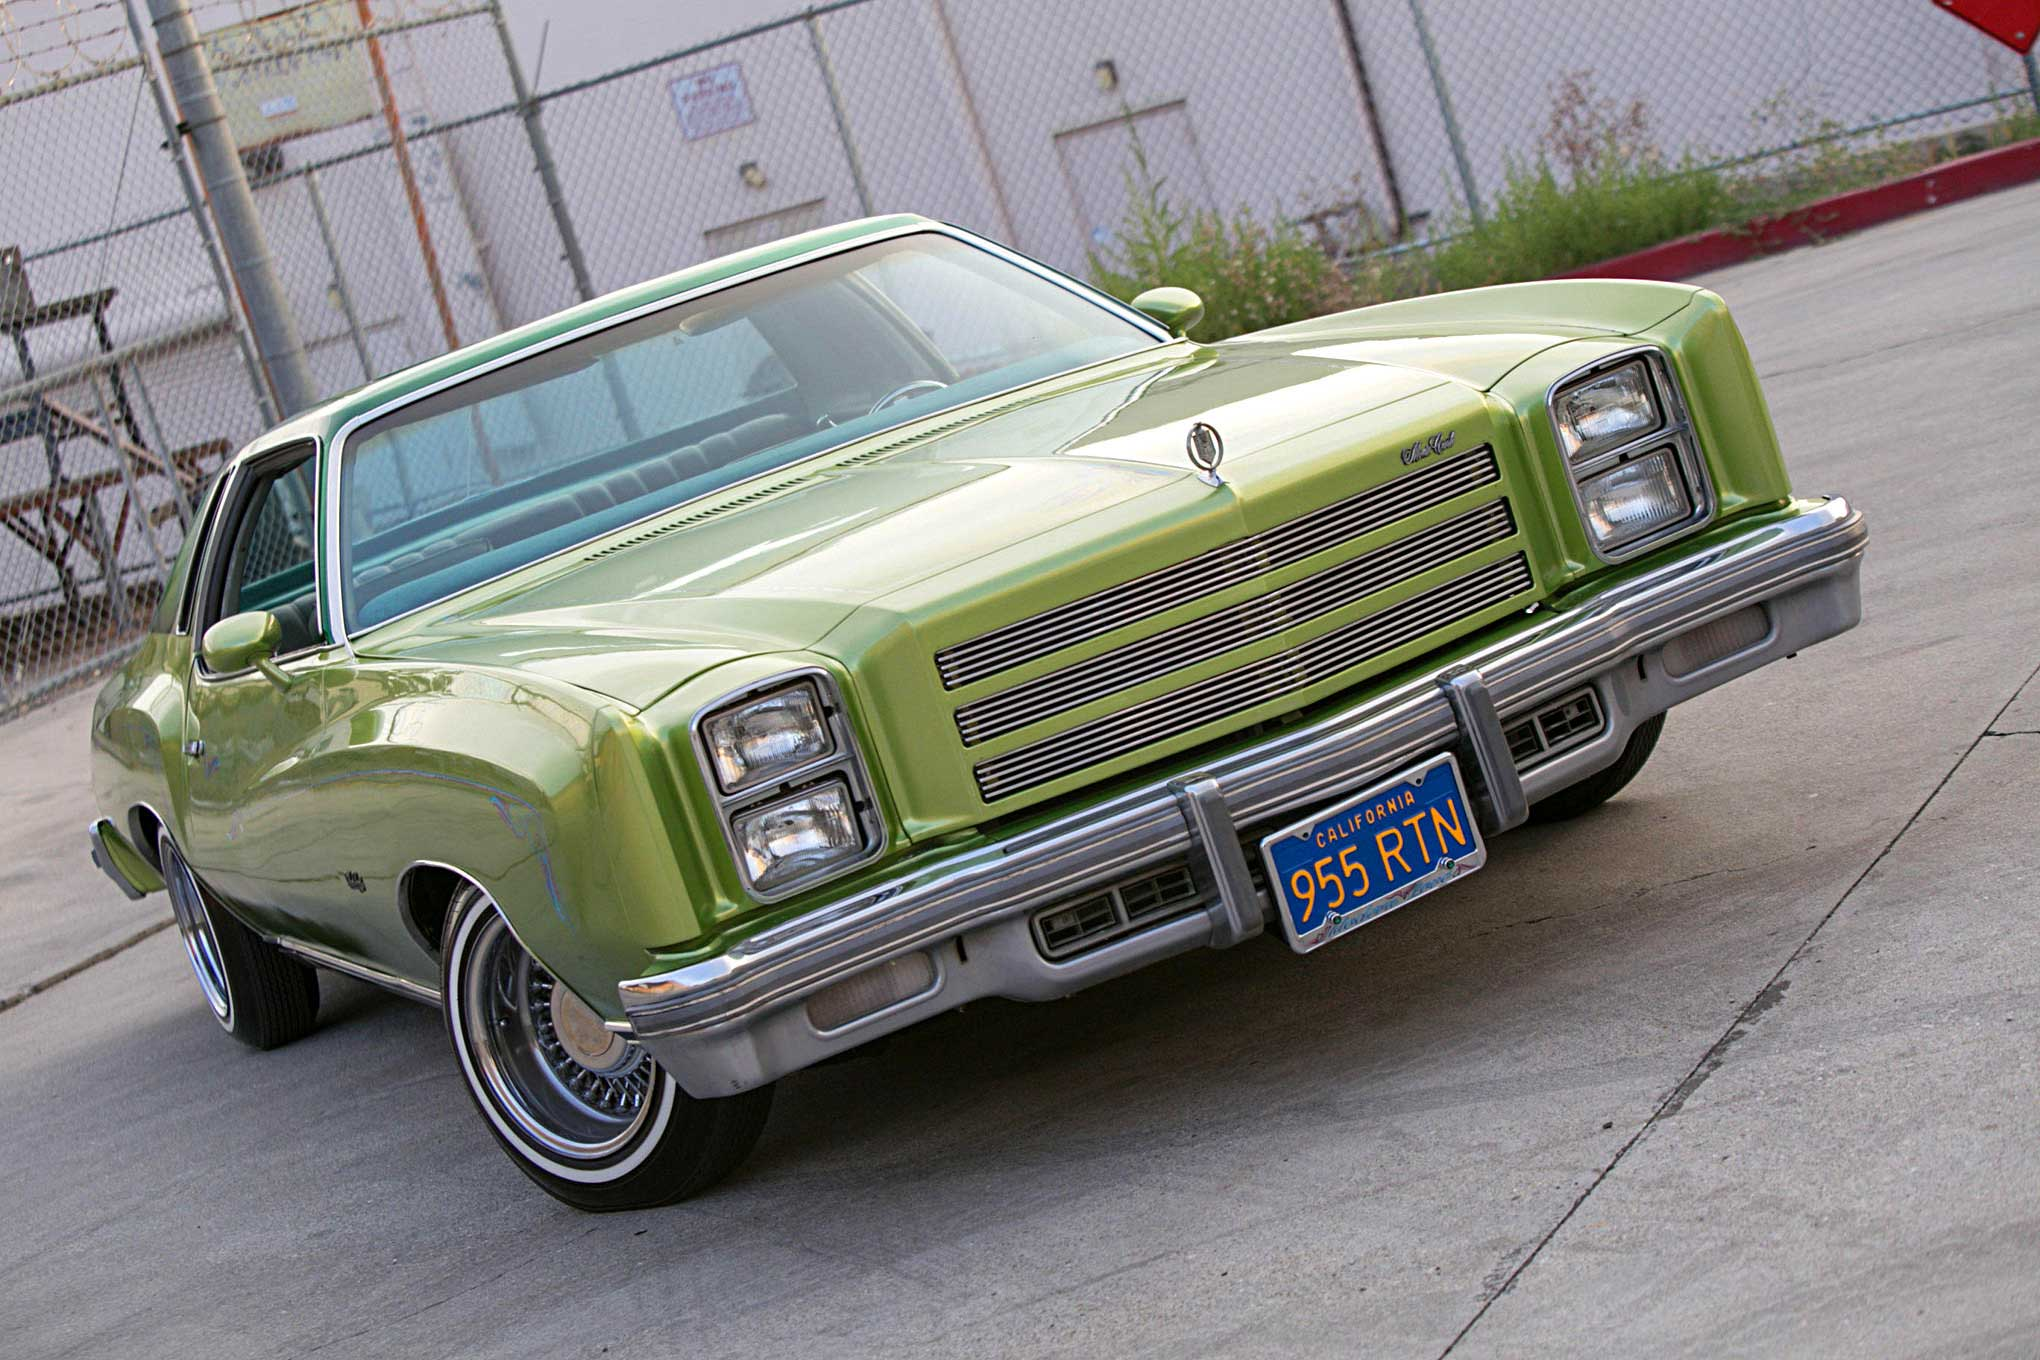 1977 Chevrolet Monte Carlo Modern Love